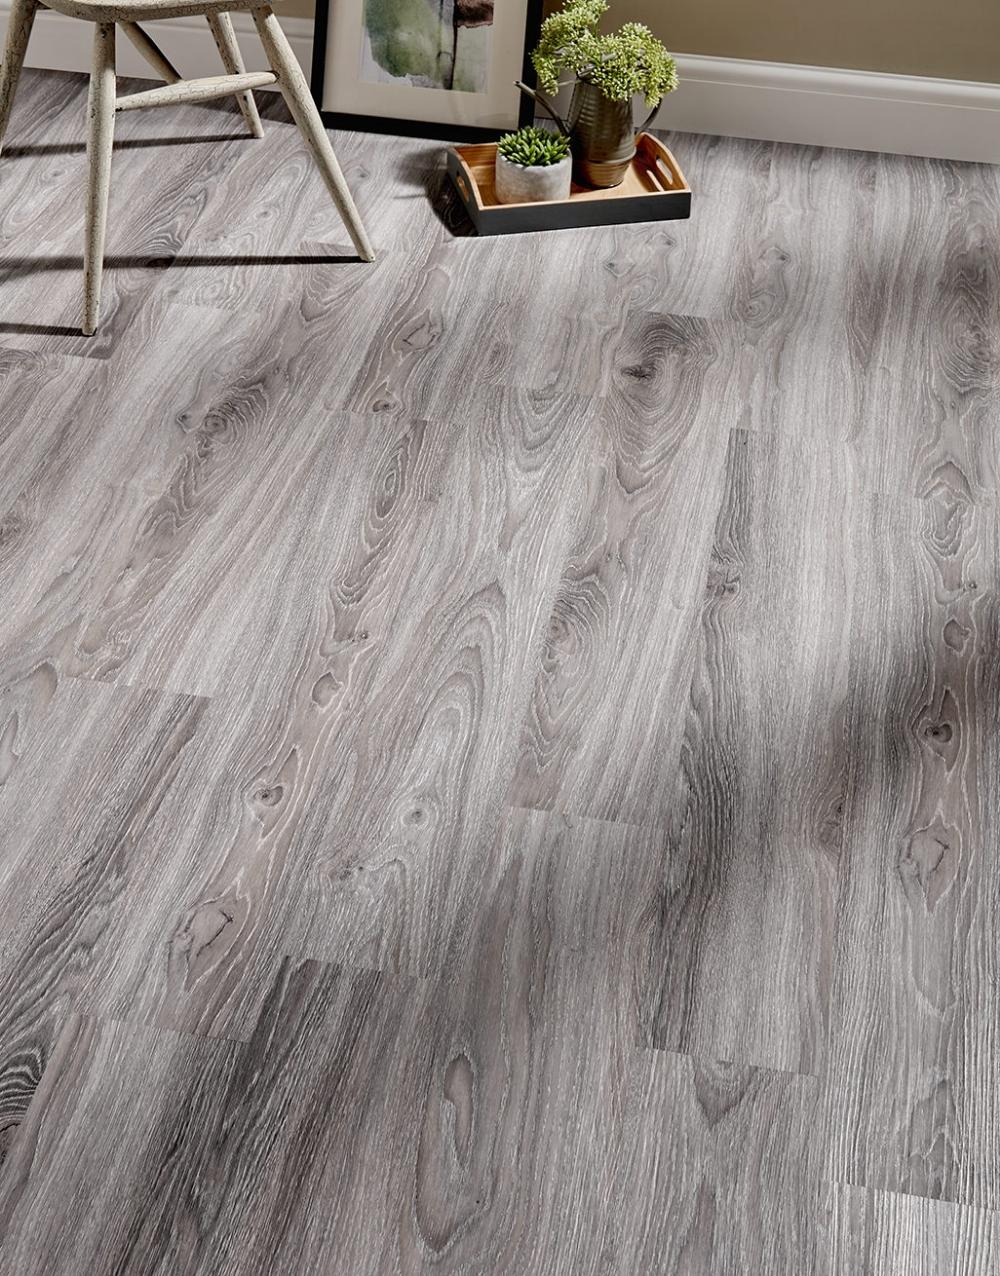 Florence Grey Oak Luxury Vinyl Tile Flooring (With